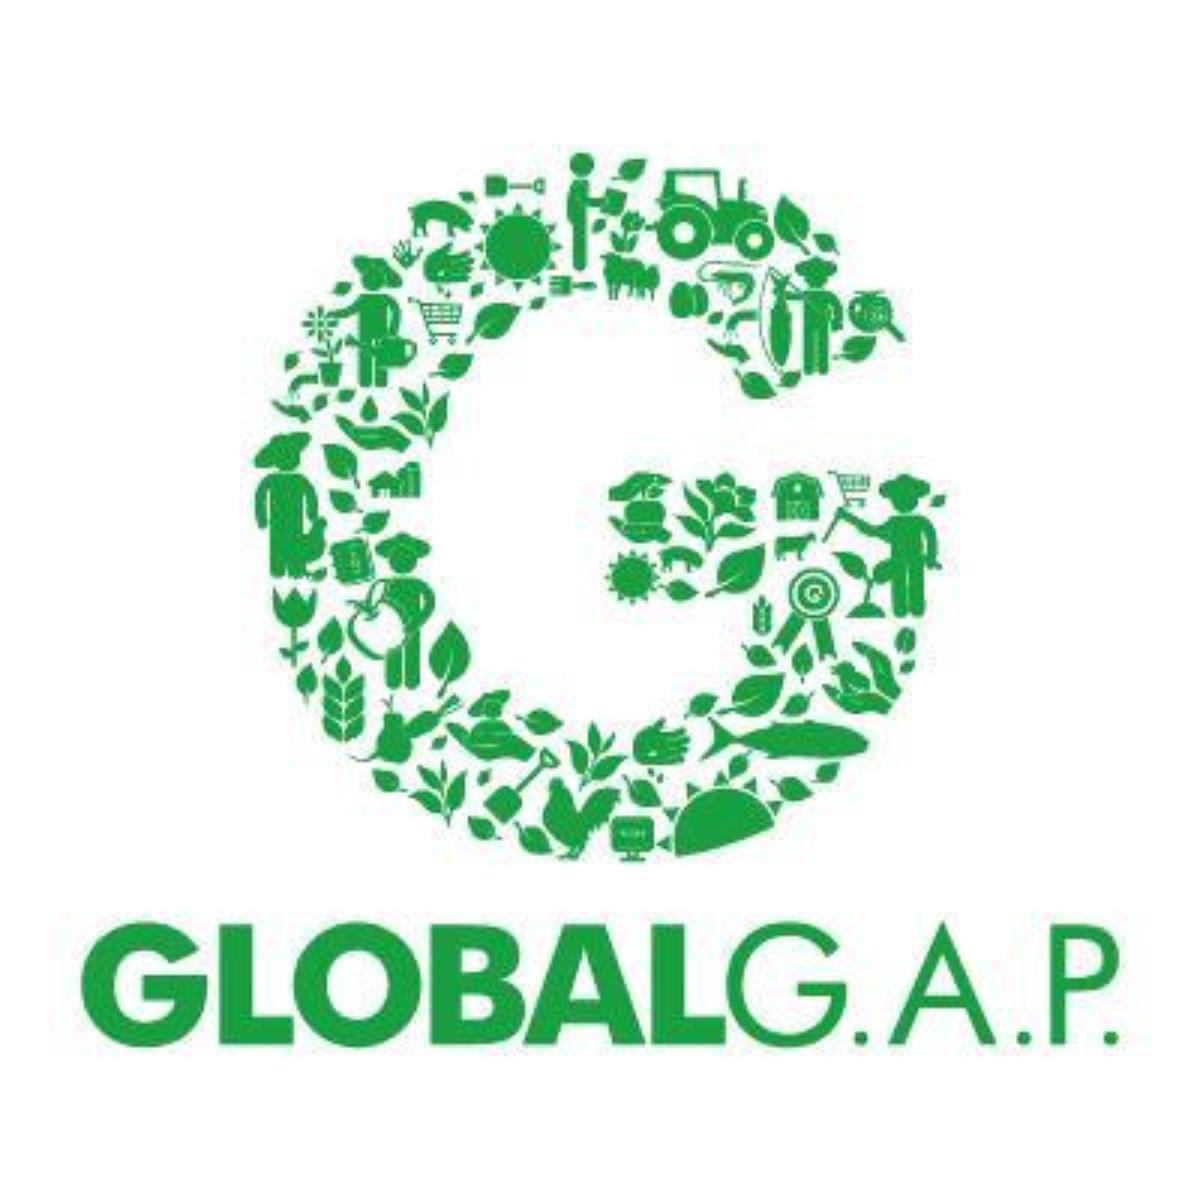 GlobalGAP.jpg